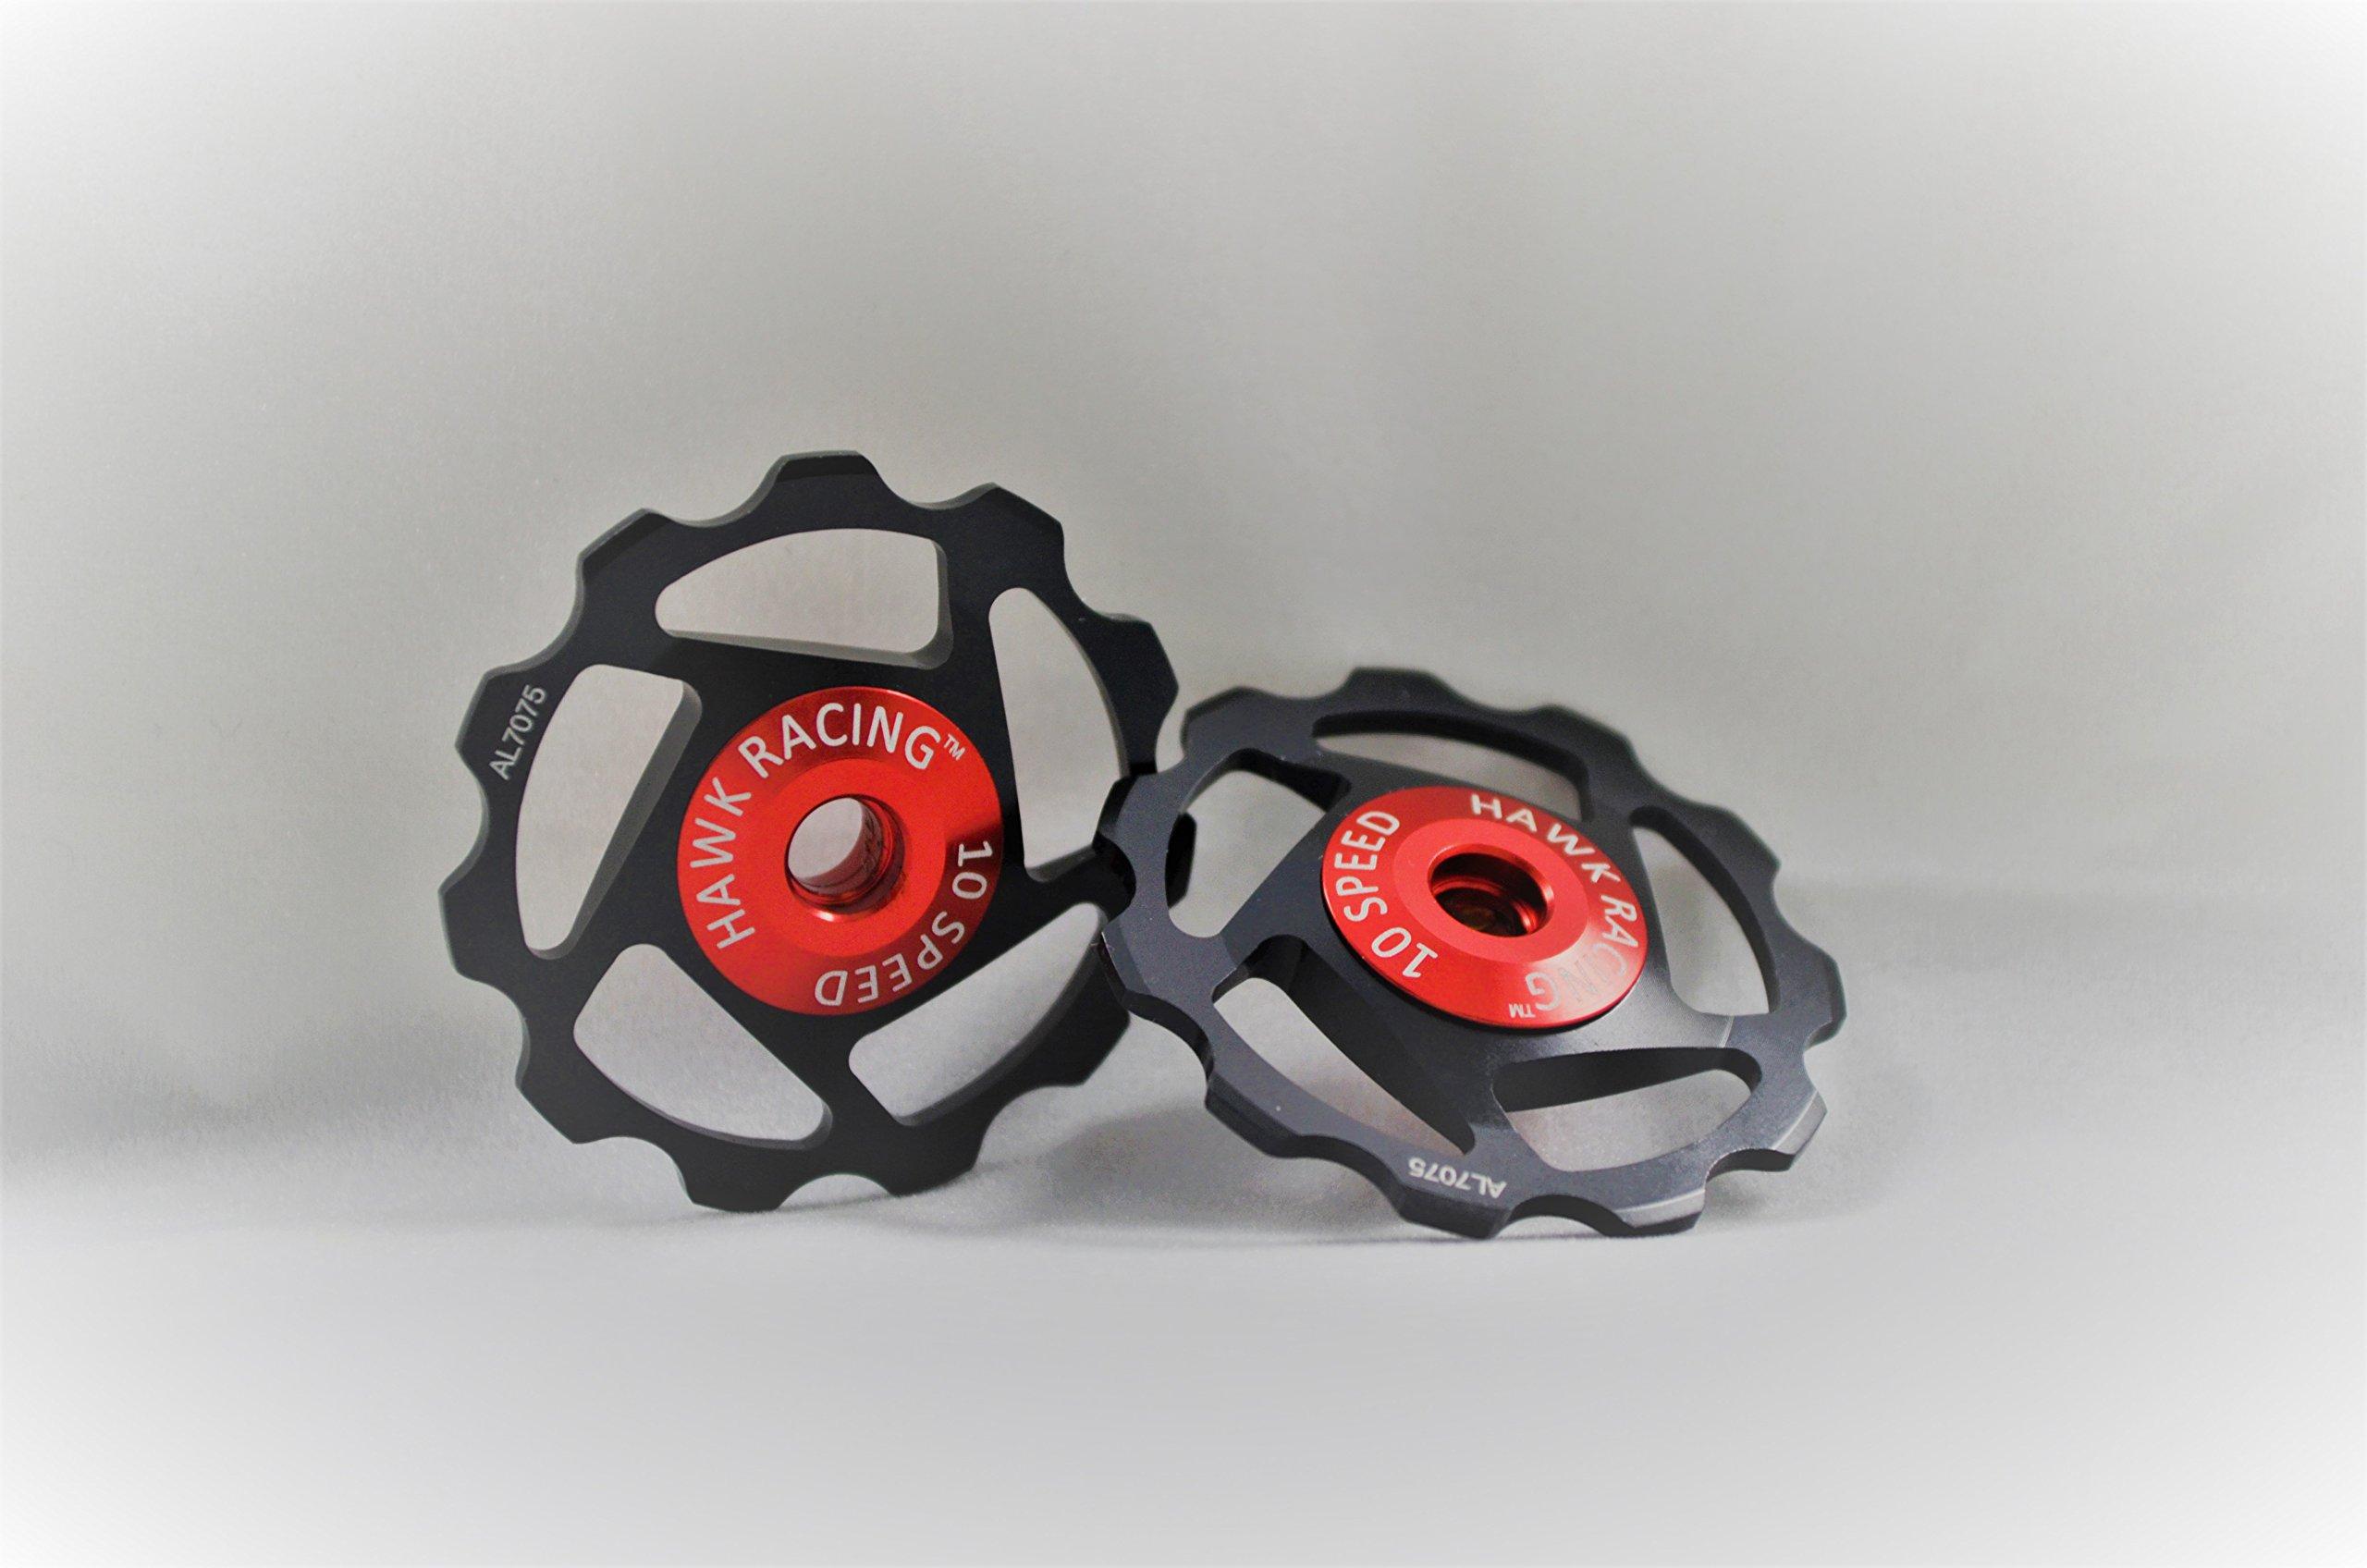 Hawk Racing Derailleur Pulley, 10 speed, Red, SRAM